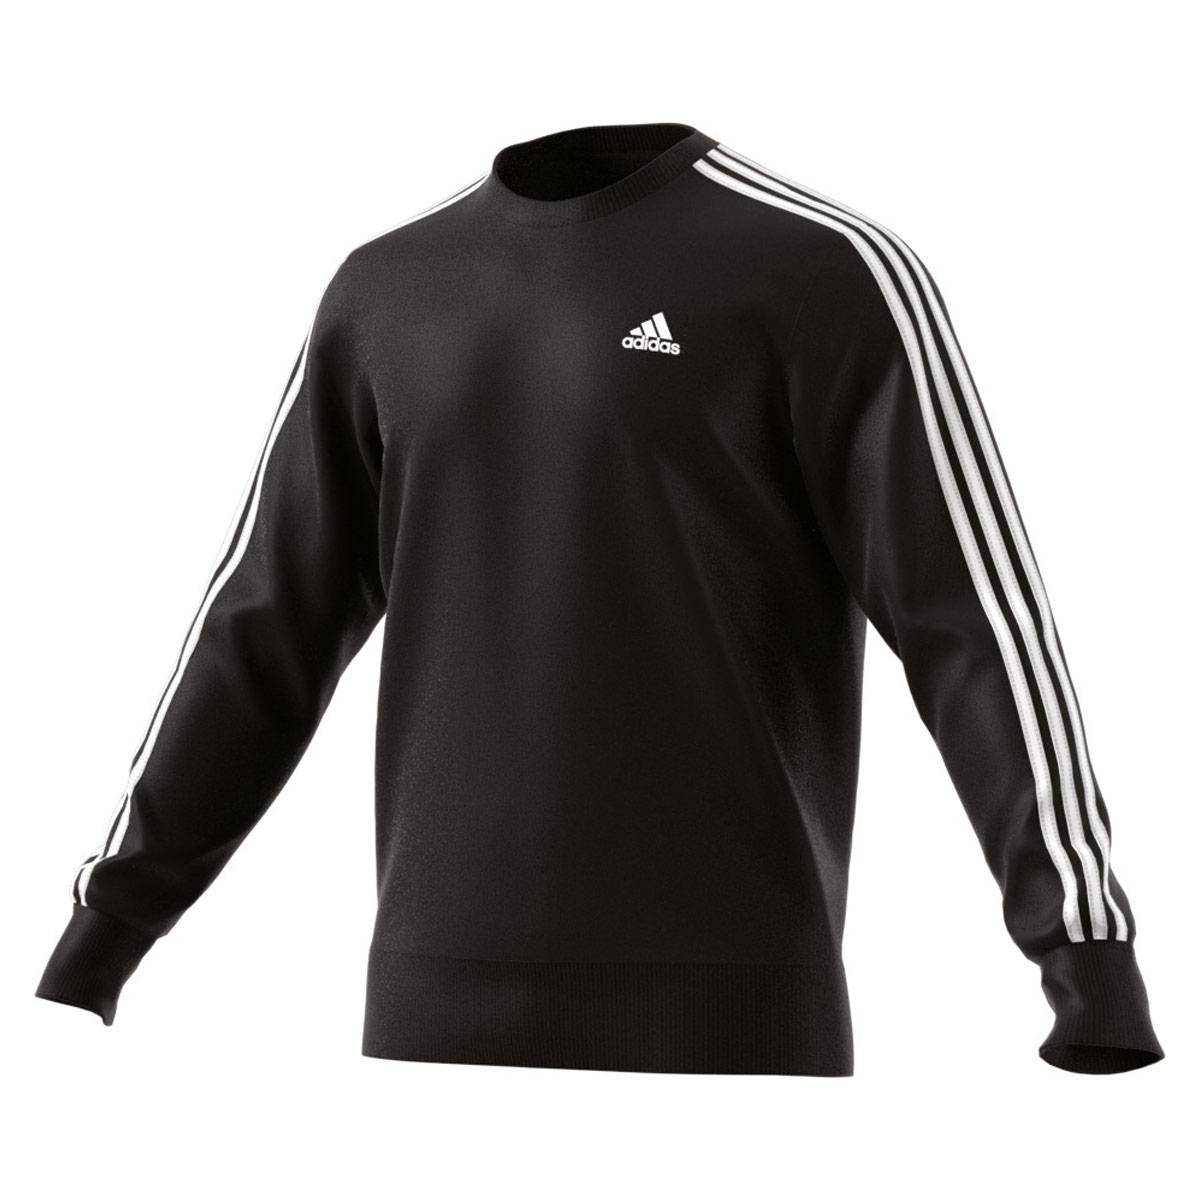 73a3131c0 adidas Essentials 3-Stripes Crew Sweatshirt - Sweatshirts / Hoodies for Men  - Black | 21RUN